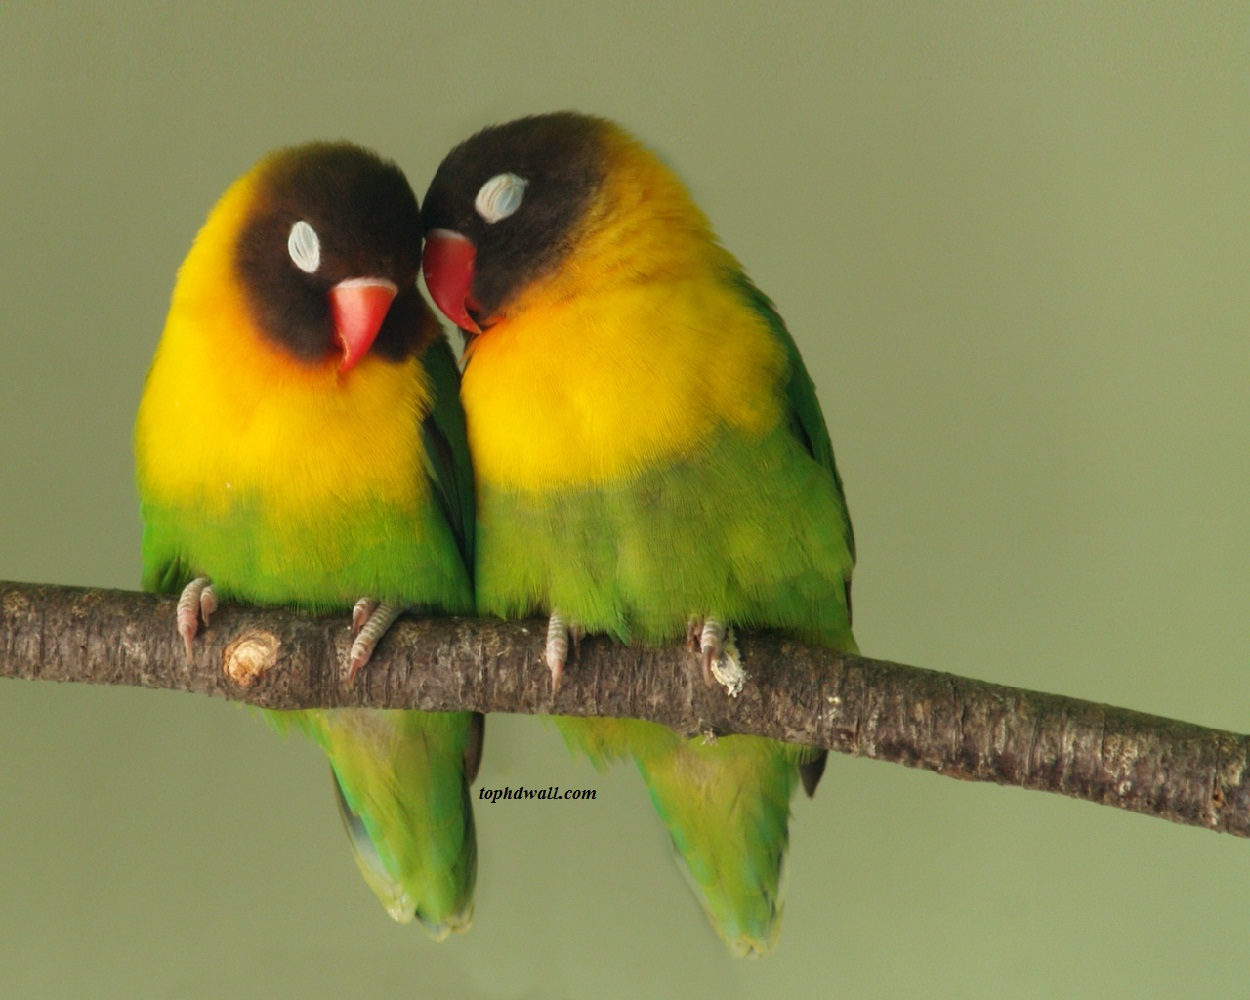 Cute Love Birds Wallpapers Love Birds Wallpaper 1250x1000 Download Hd Wallpaper Wallpapertip